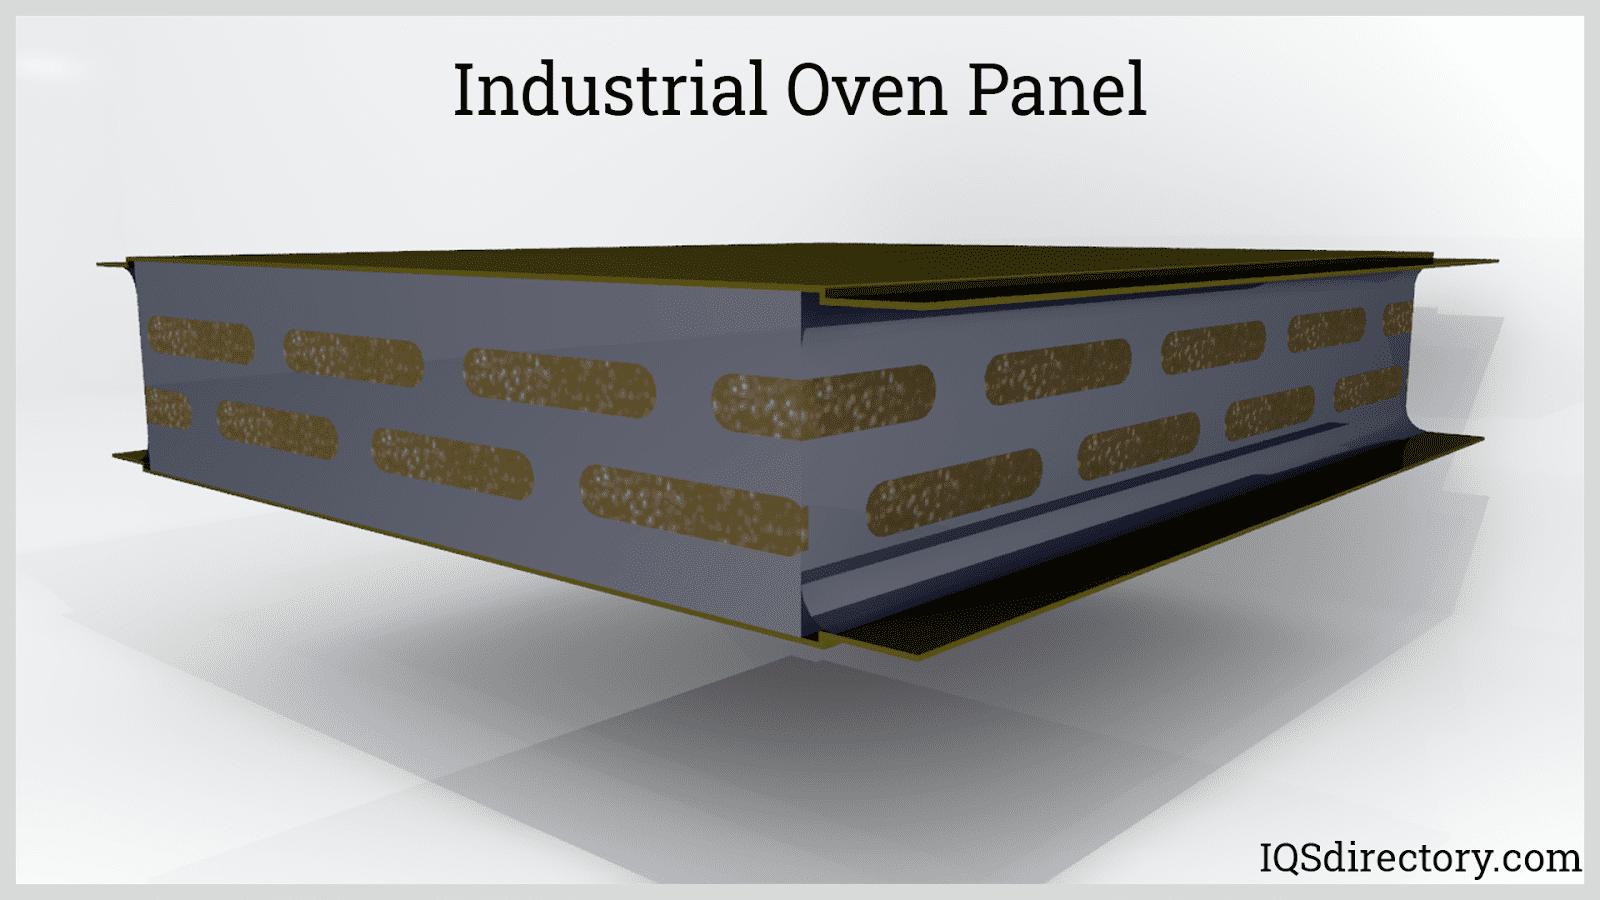 Industrial Oven Panel